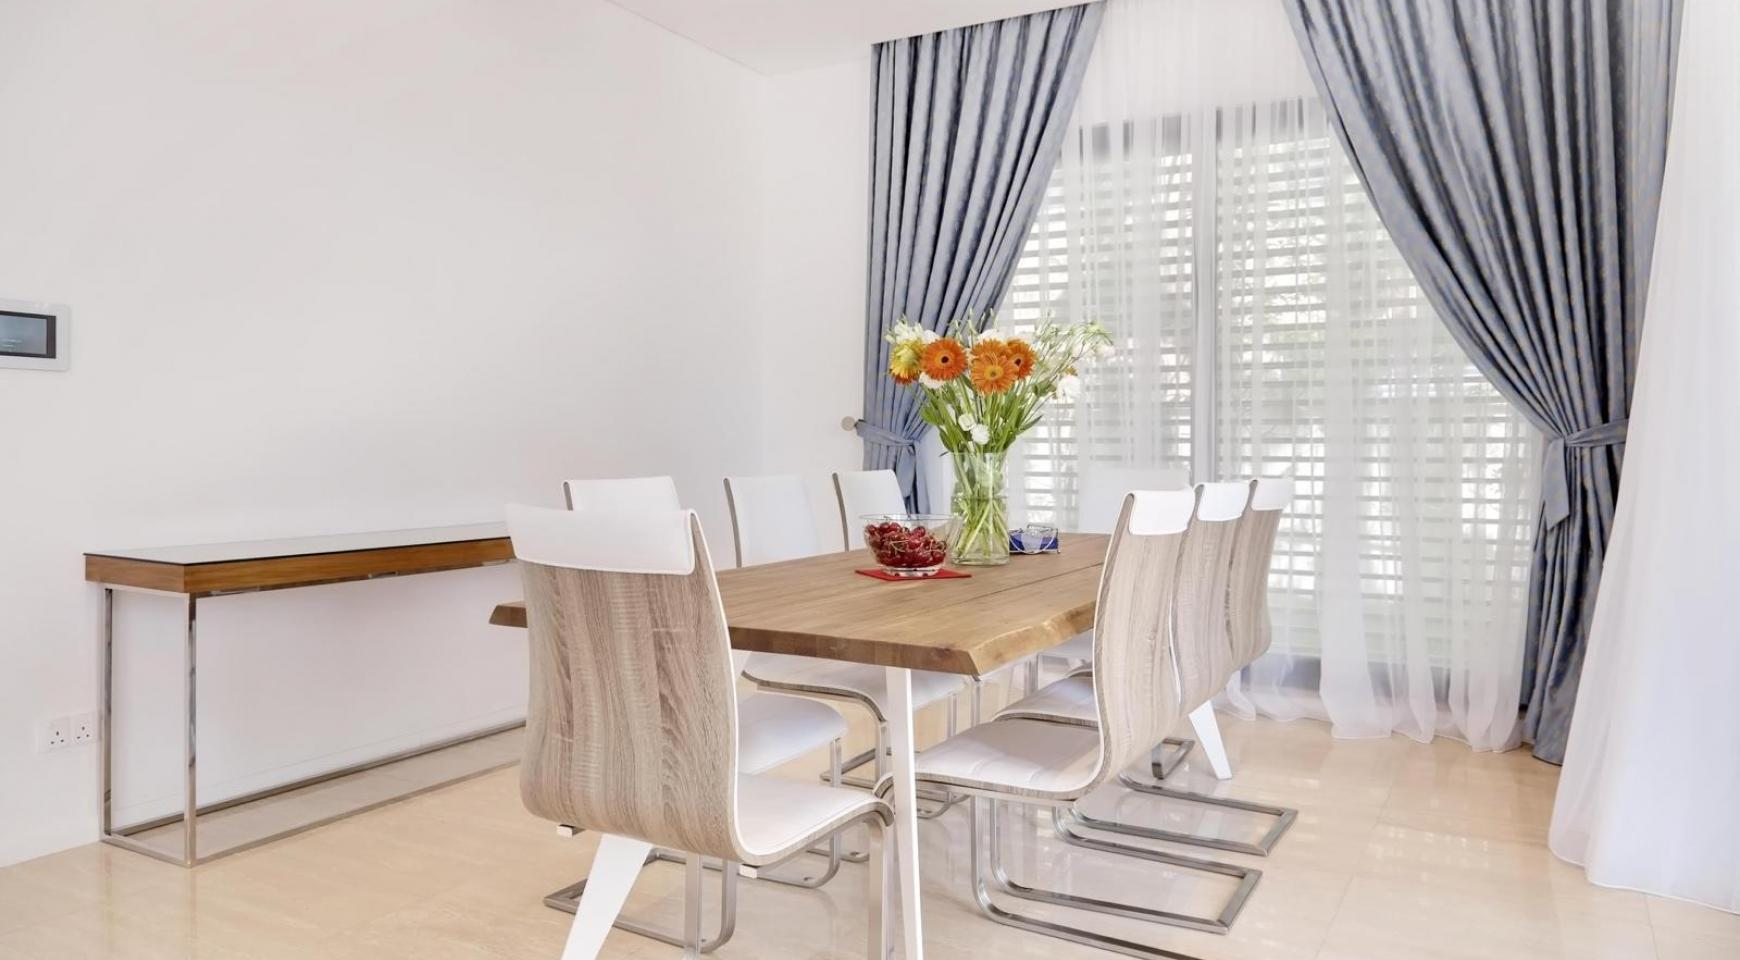 New Luxurious 4 Bedroom Villa in the Tourist Area - 23